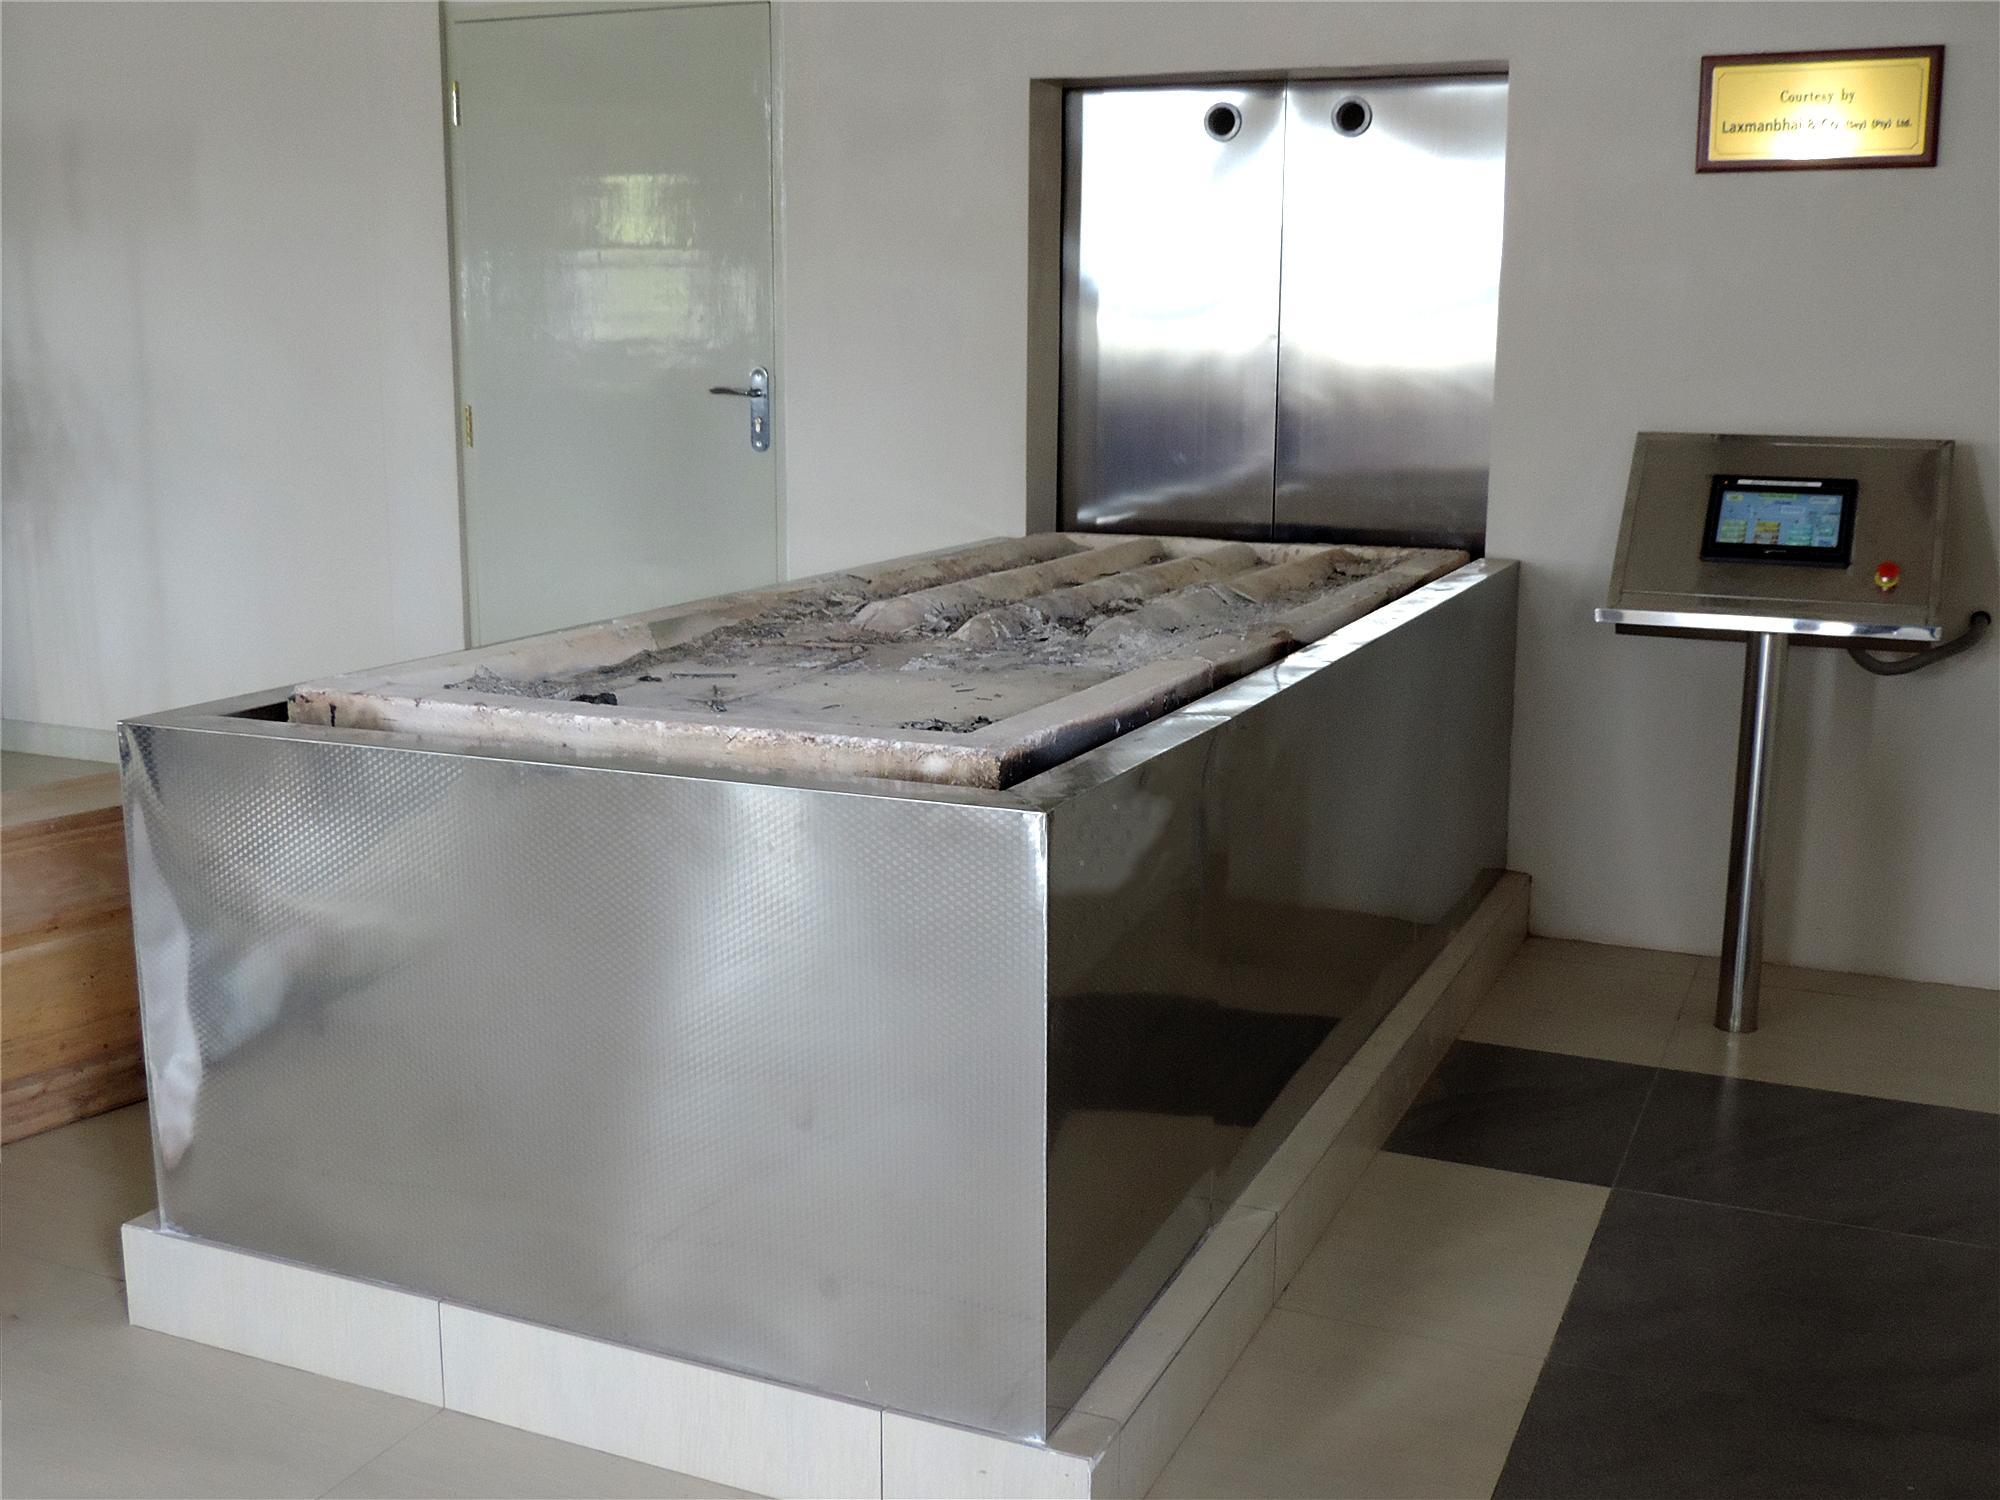 Equipo máquina crematorio from china de crematorio cremación 9